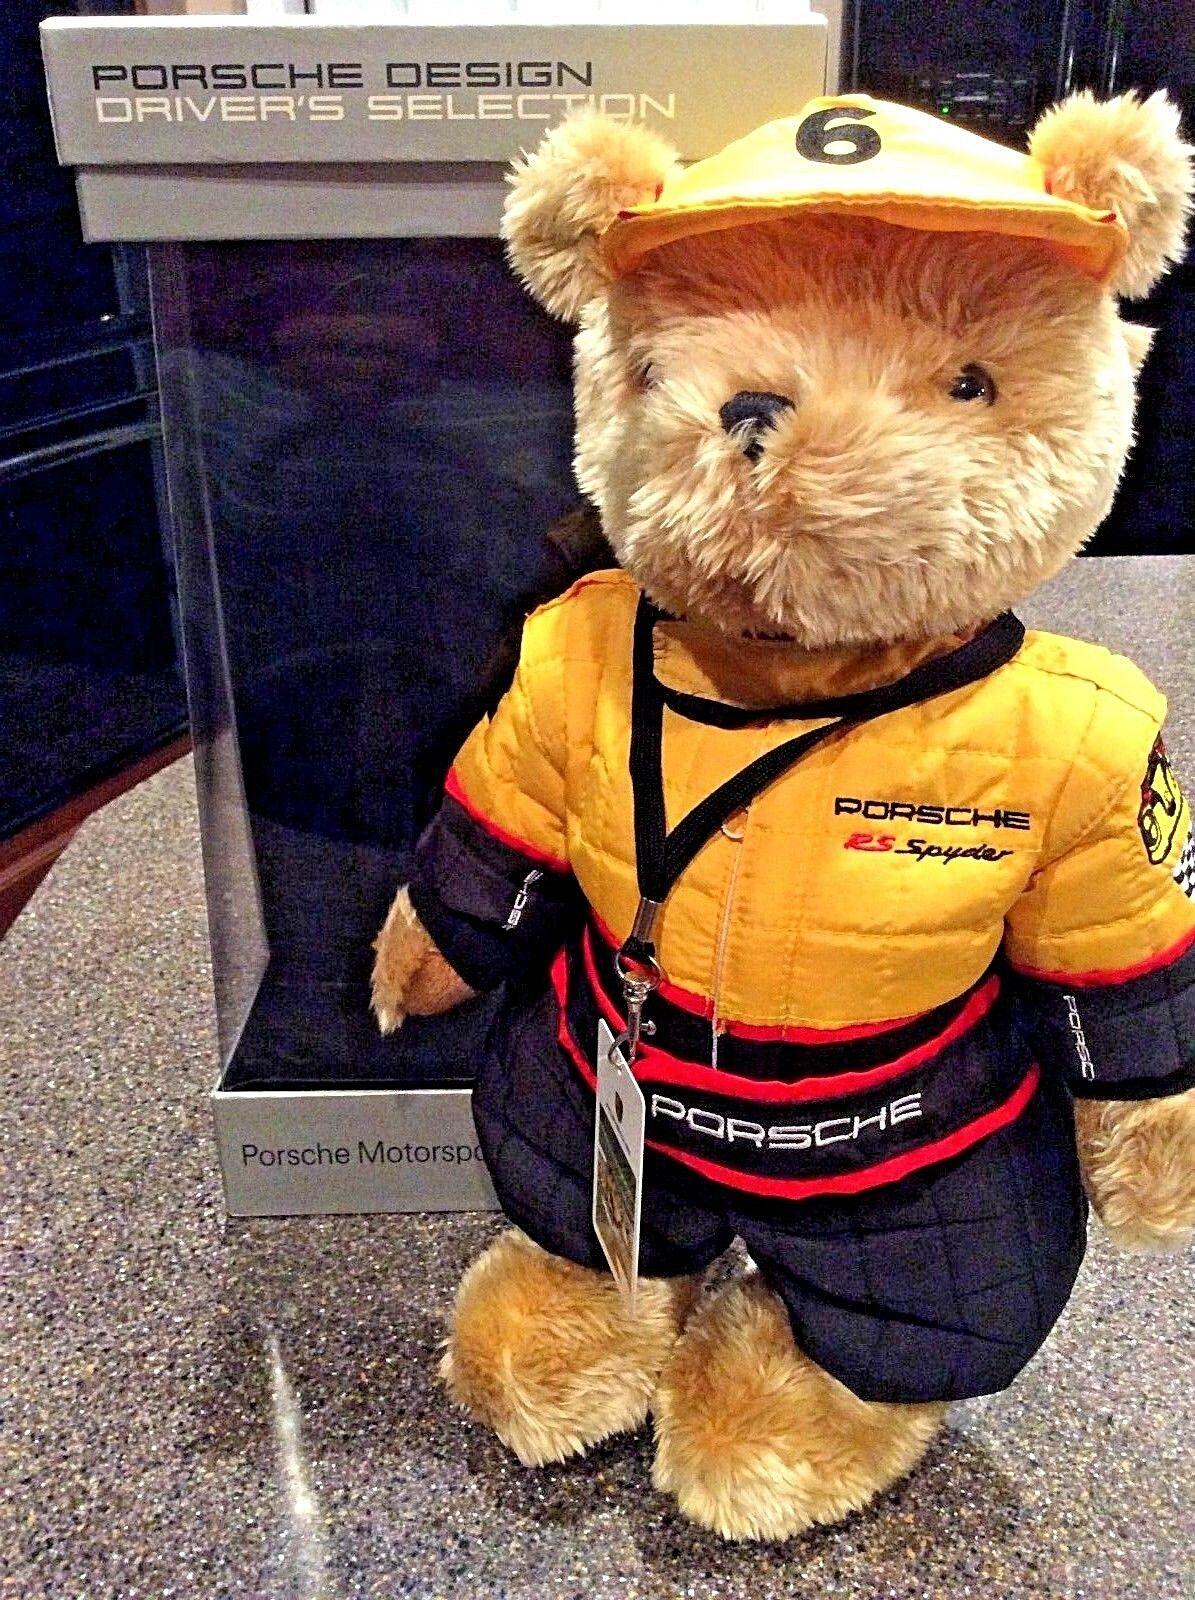 Porsche RS Spyder Collectors Plush Bear - Porsche Design Driver's Collection